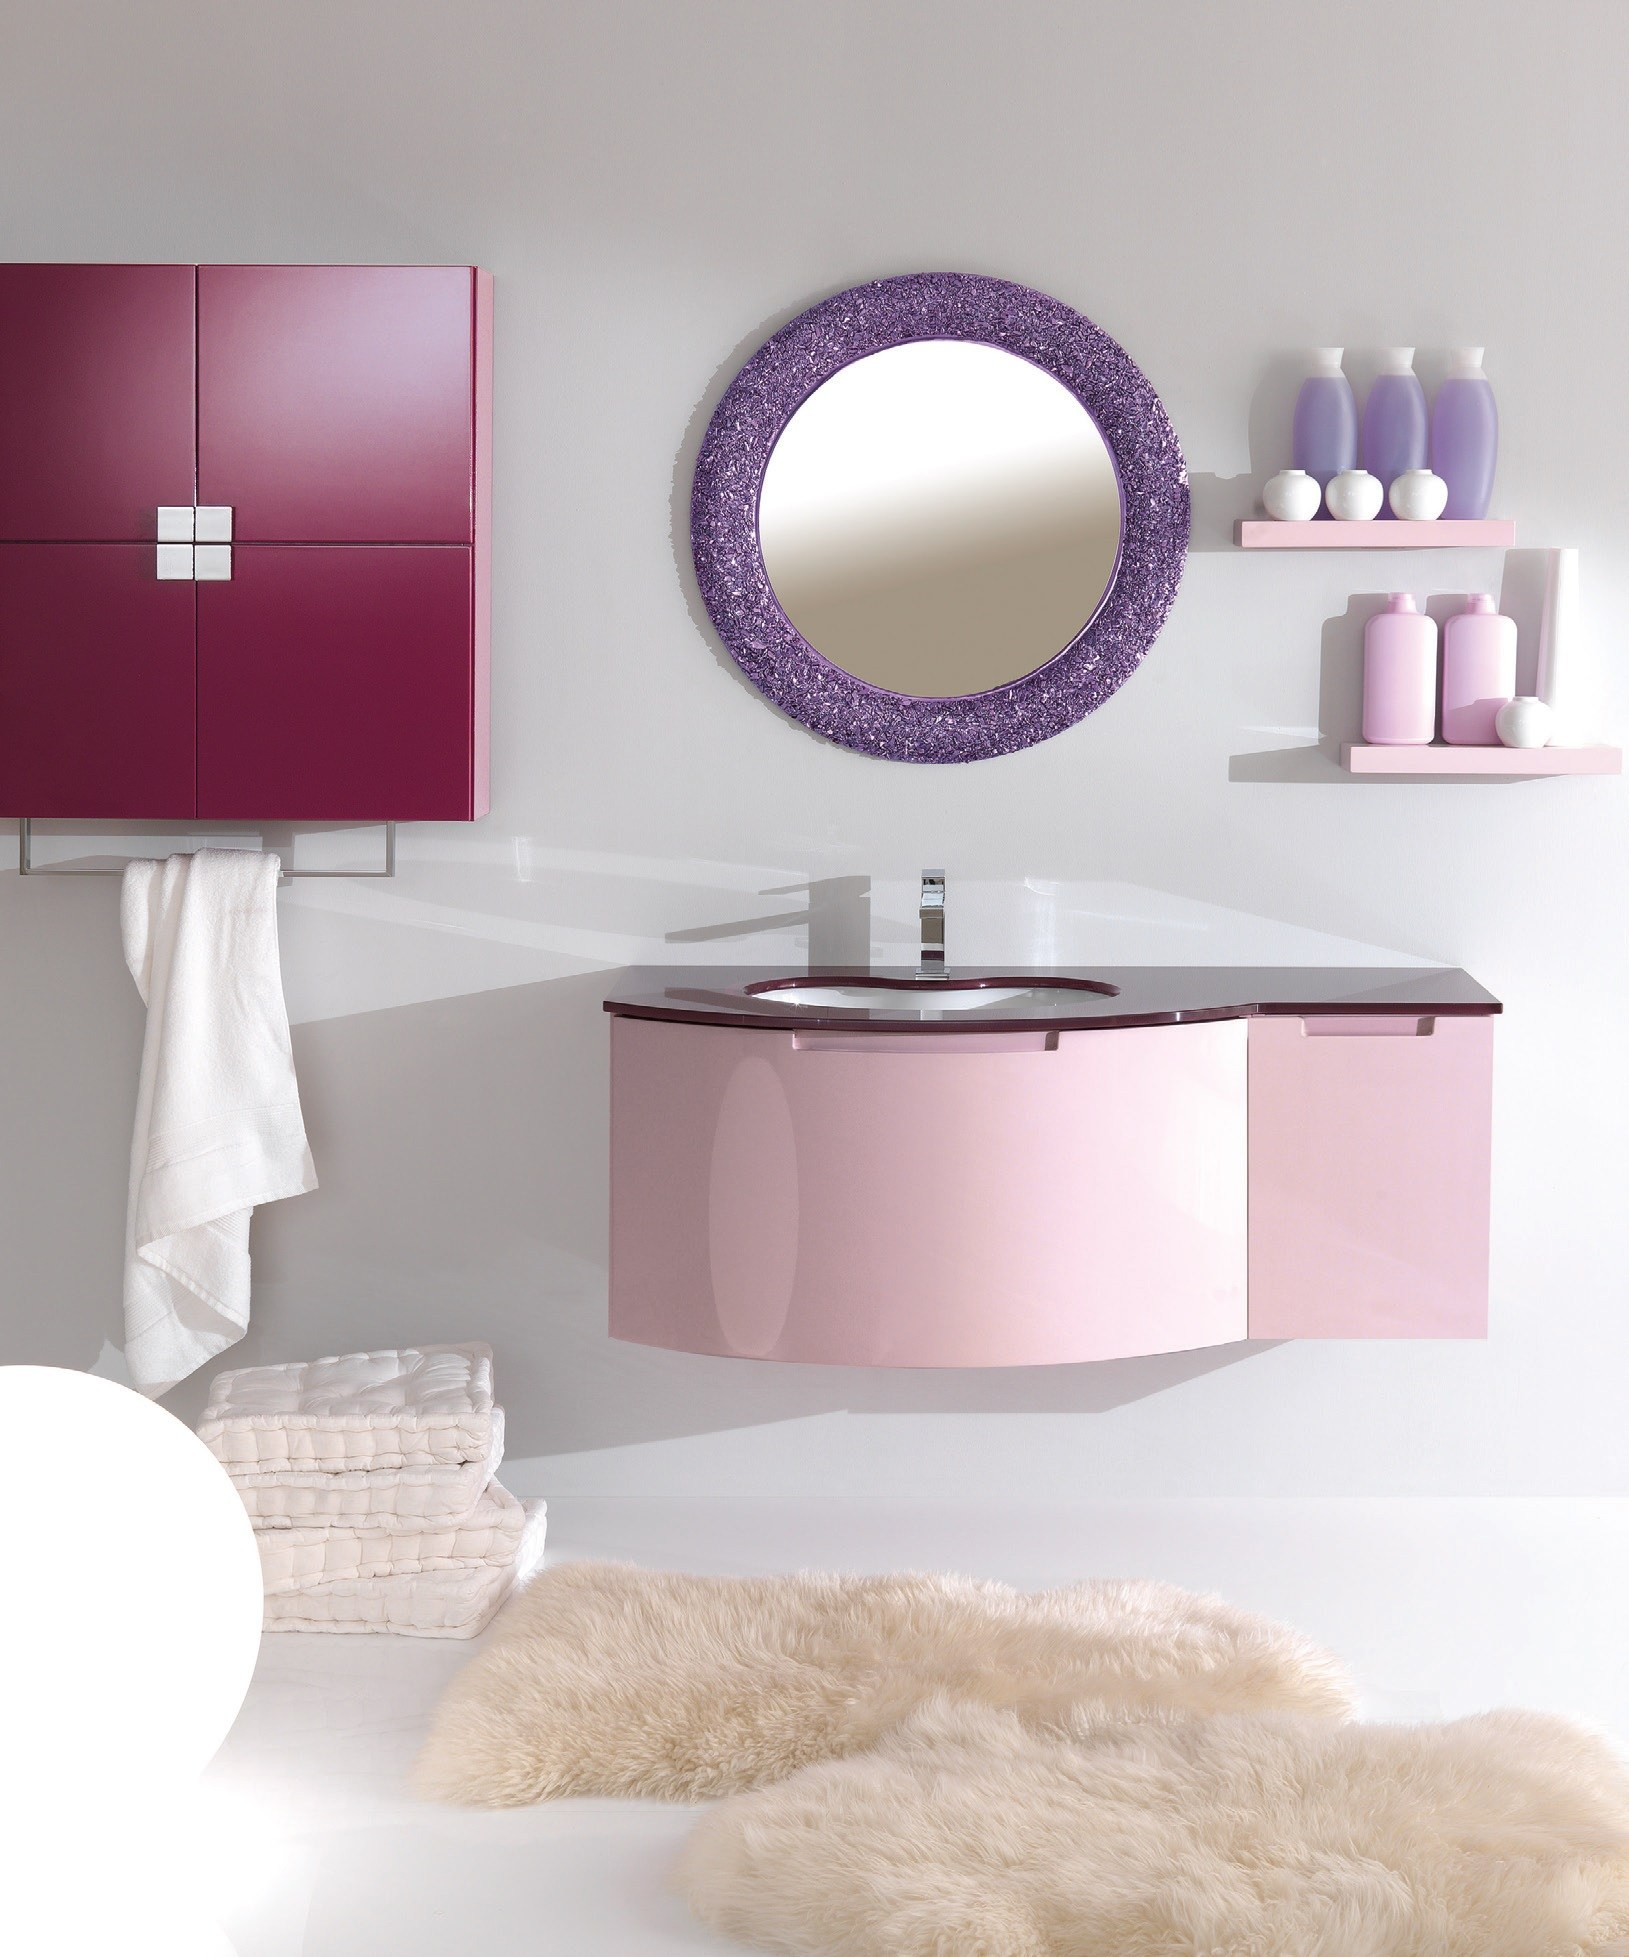 Miroir Pour Salle De Bain Glove 1 By Lasa Idea